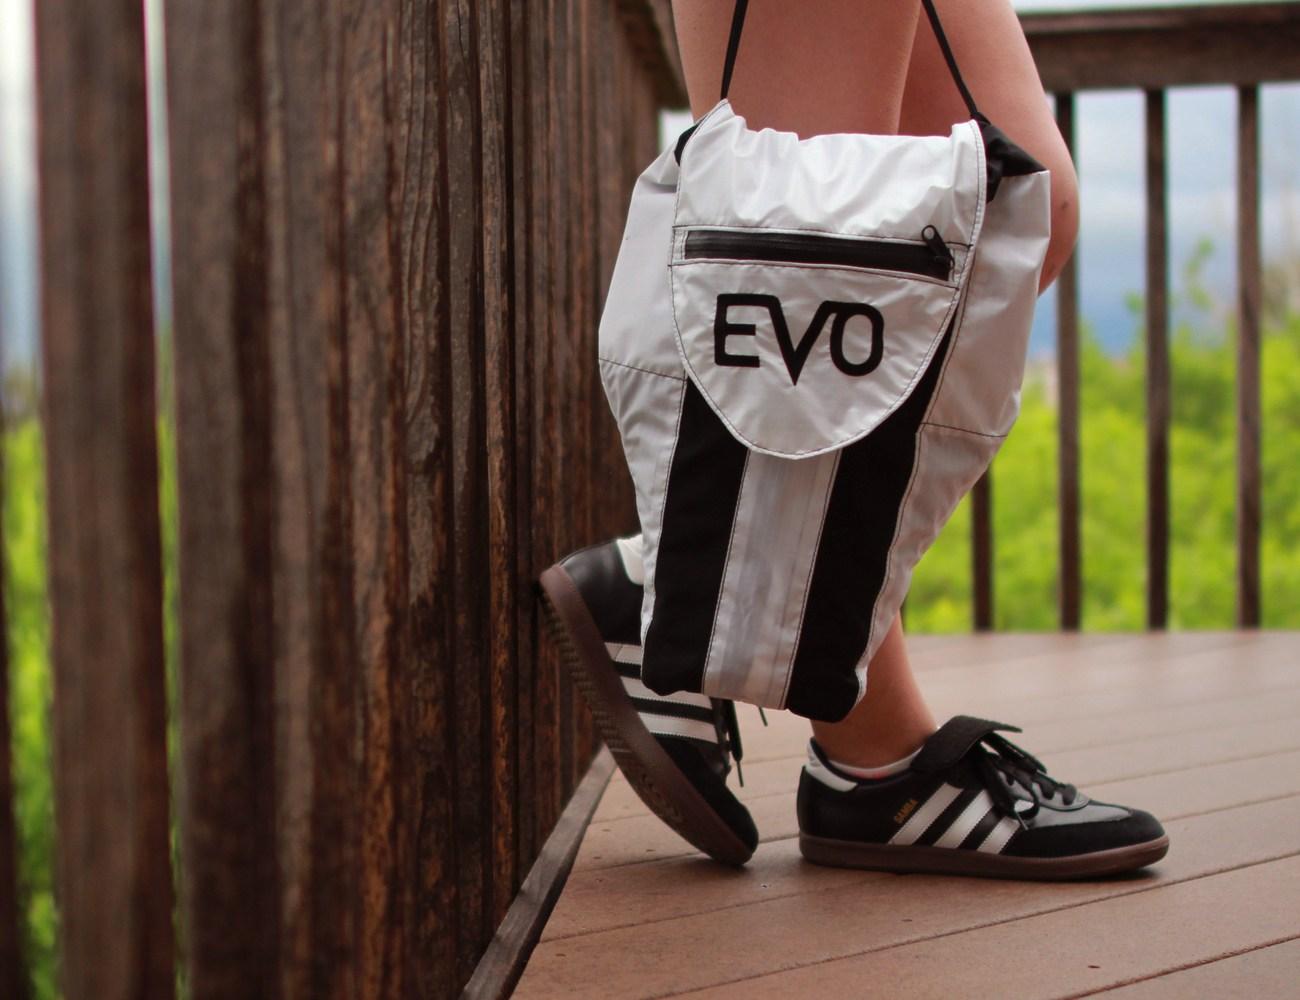 The Freshest Shoebag – Aercase. Anti-odor. Anti-bacterial.